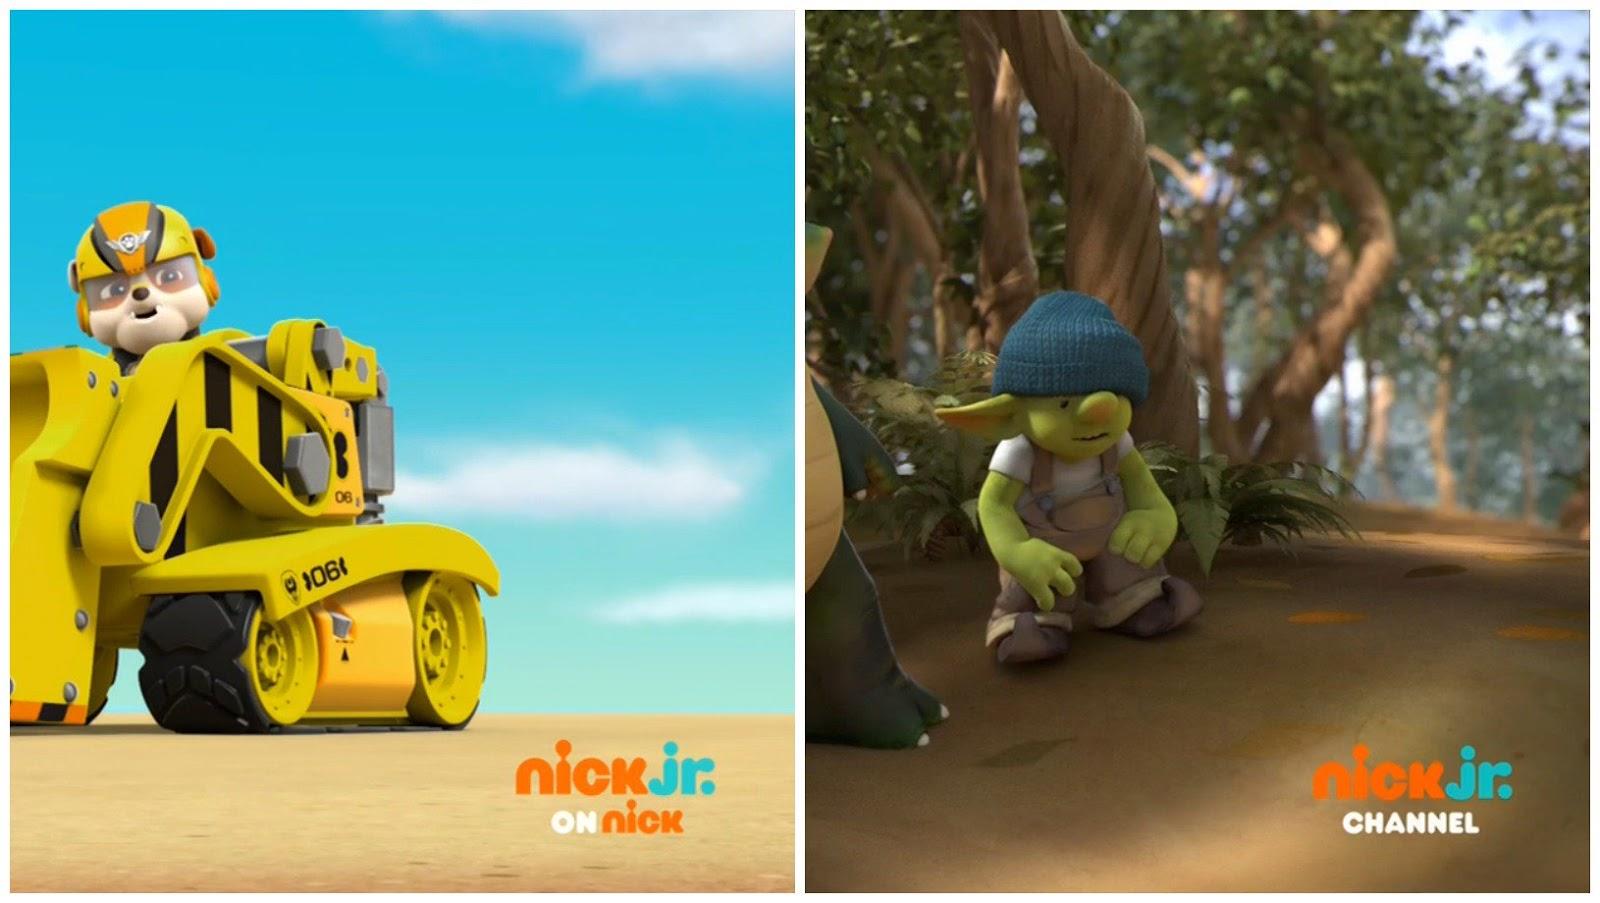 Nickalive Nickelodeon Usa Debuts Nick Jr Rebrand